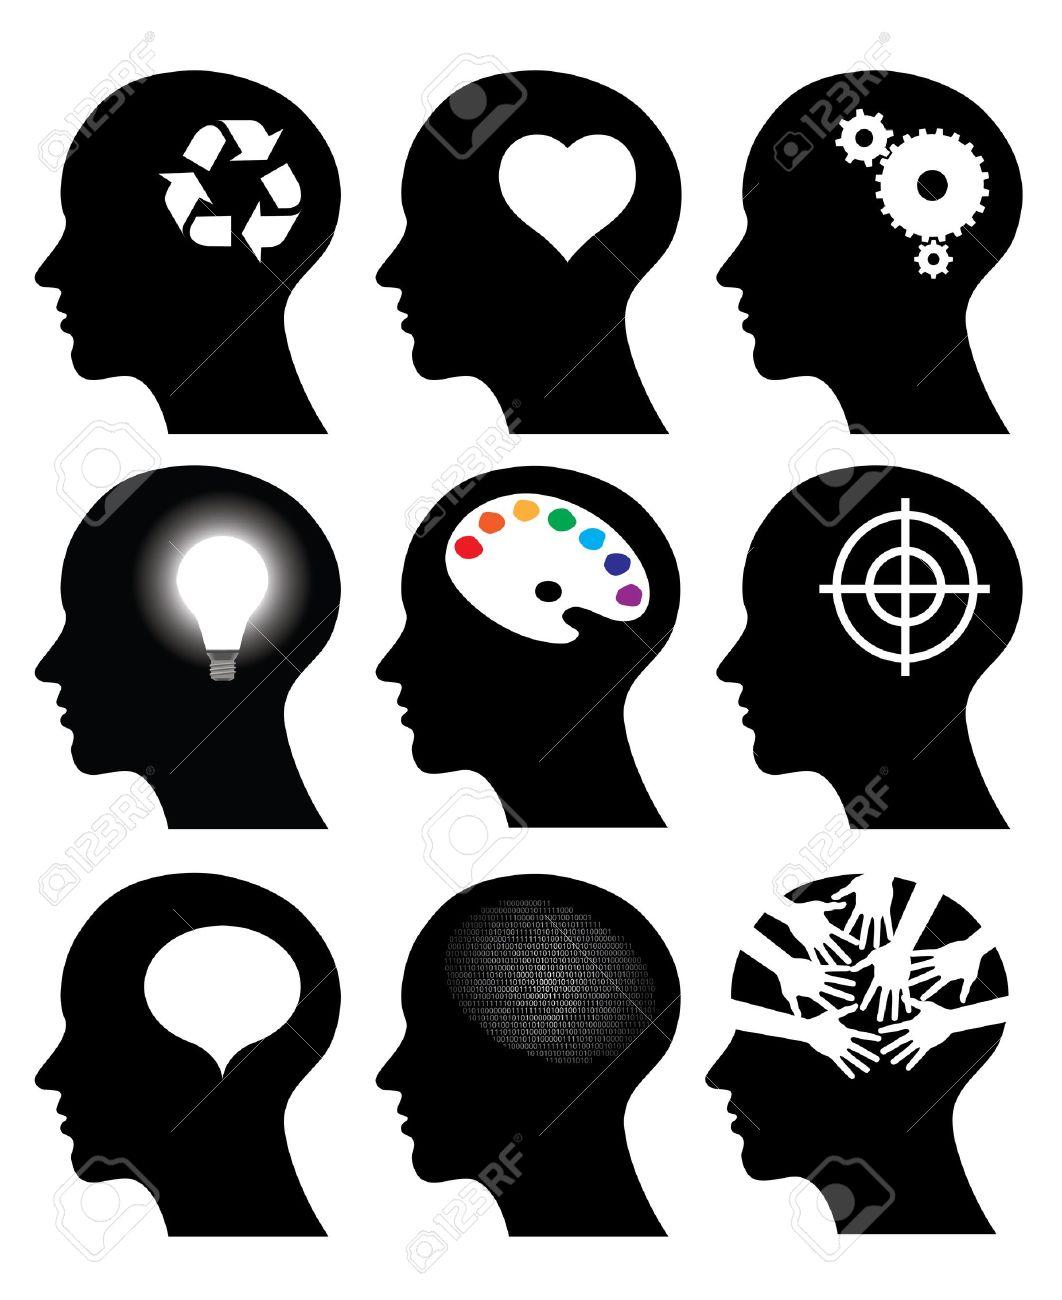 head icons with idea symbols, vector illustrations Stock Vector - 12799256